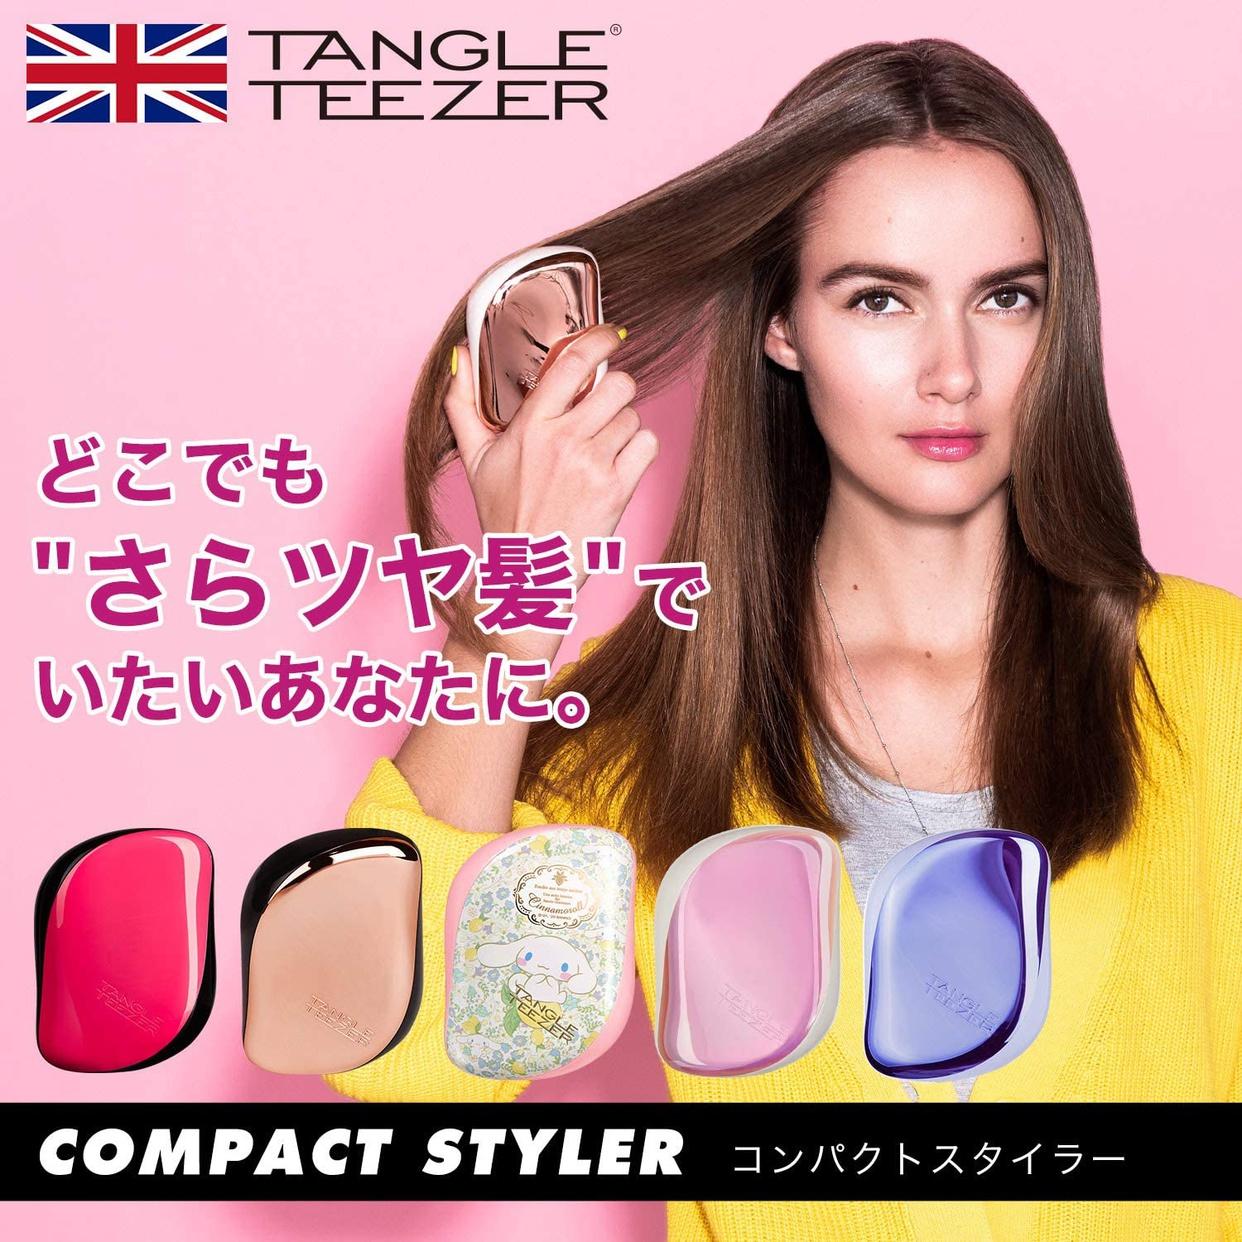 TANGLETEEZER(タングルティーザー) コンパクト スタイラーの商品画像6